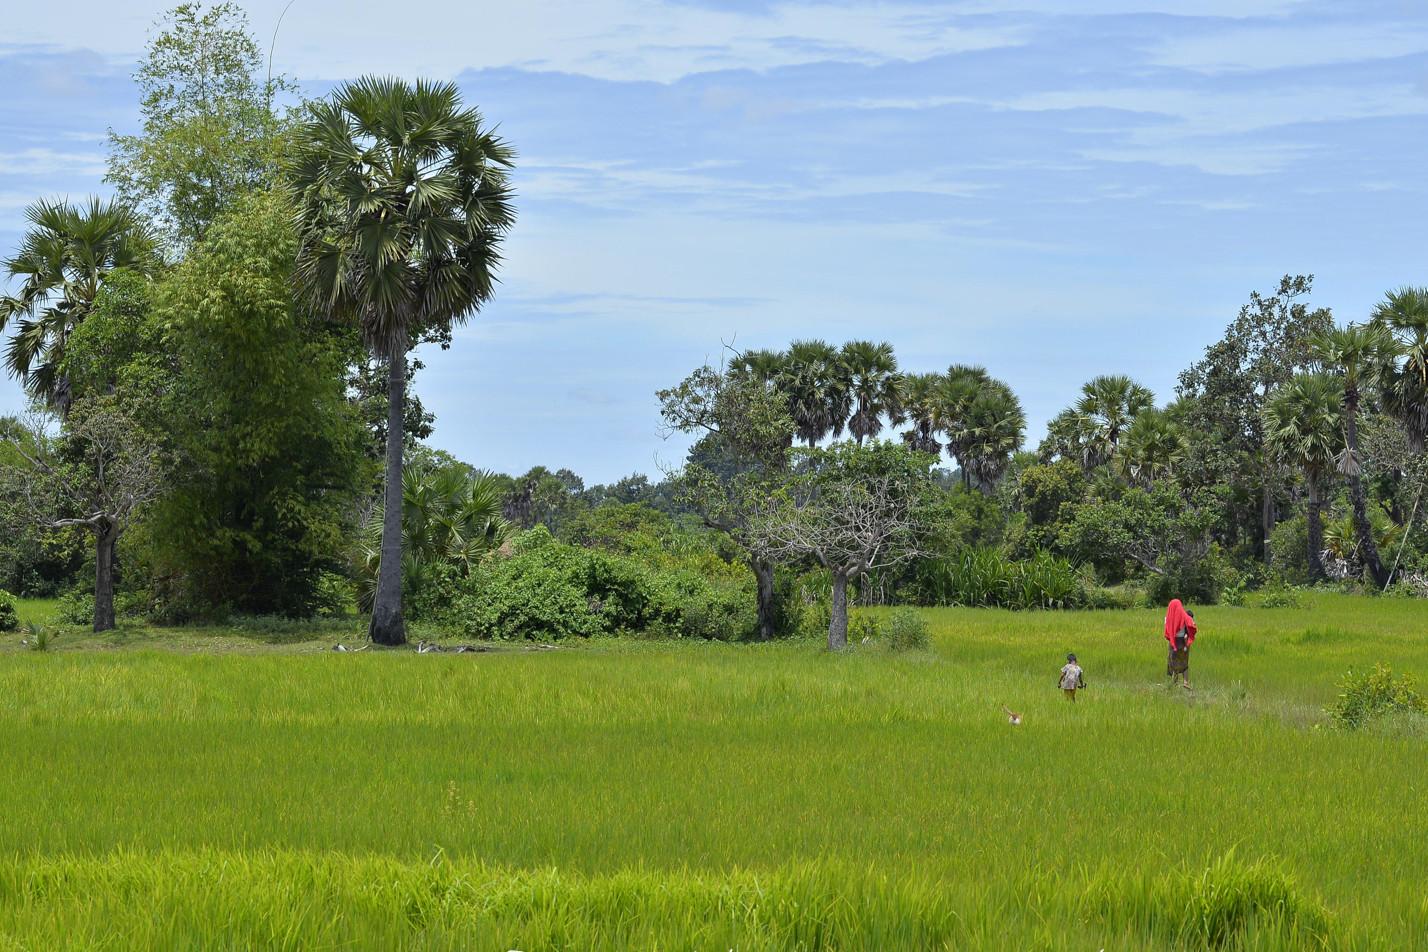 cambodia-photo-tours-landscapes-1